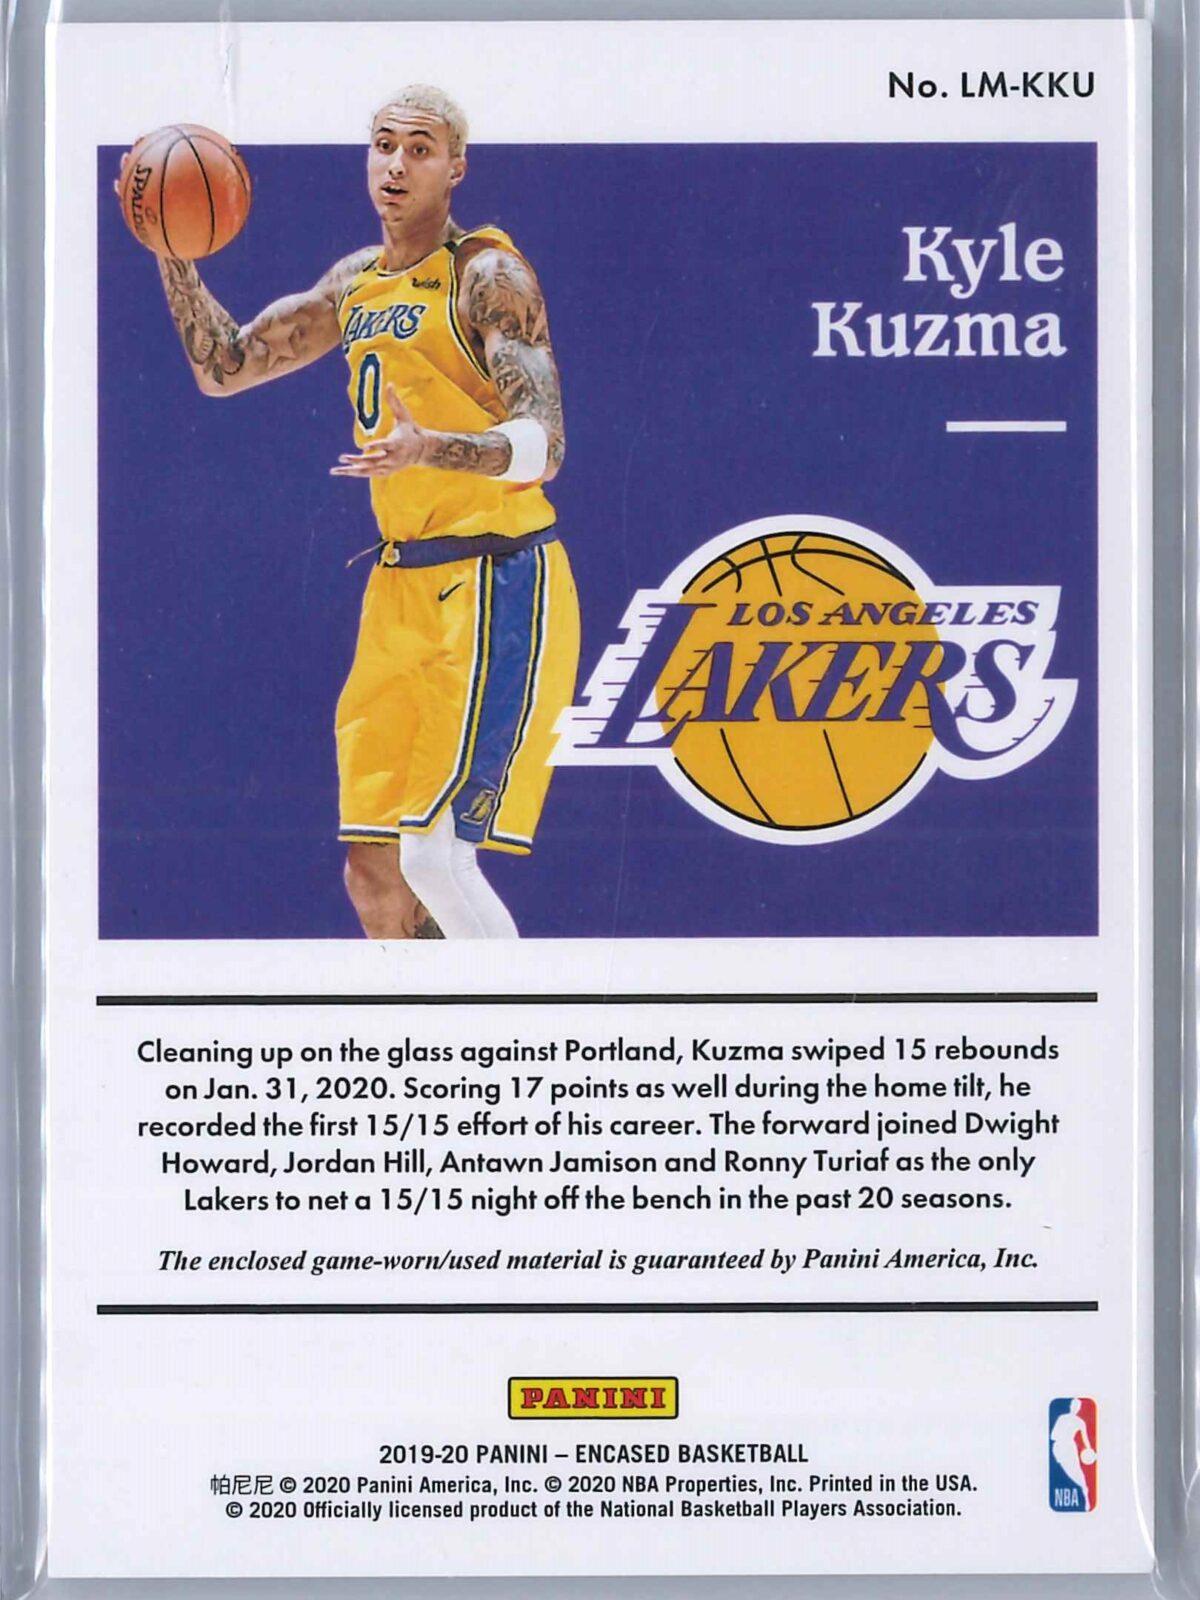 Kyle Kuzma Panini Encased 2019-20 Patch Label Materials 182/199